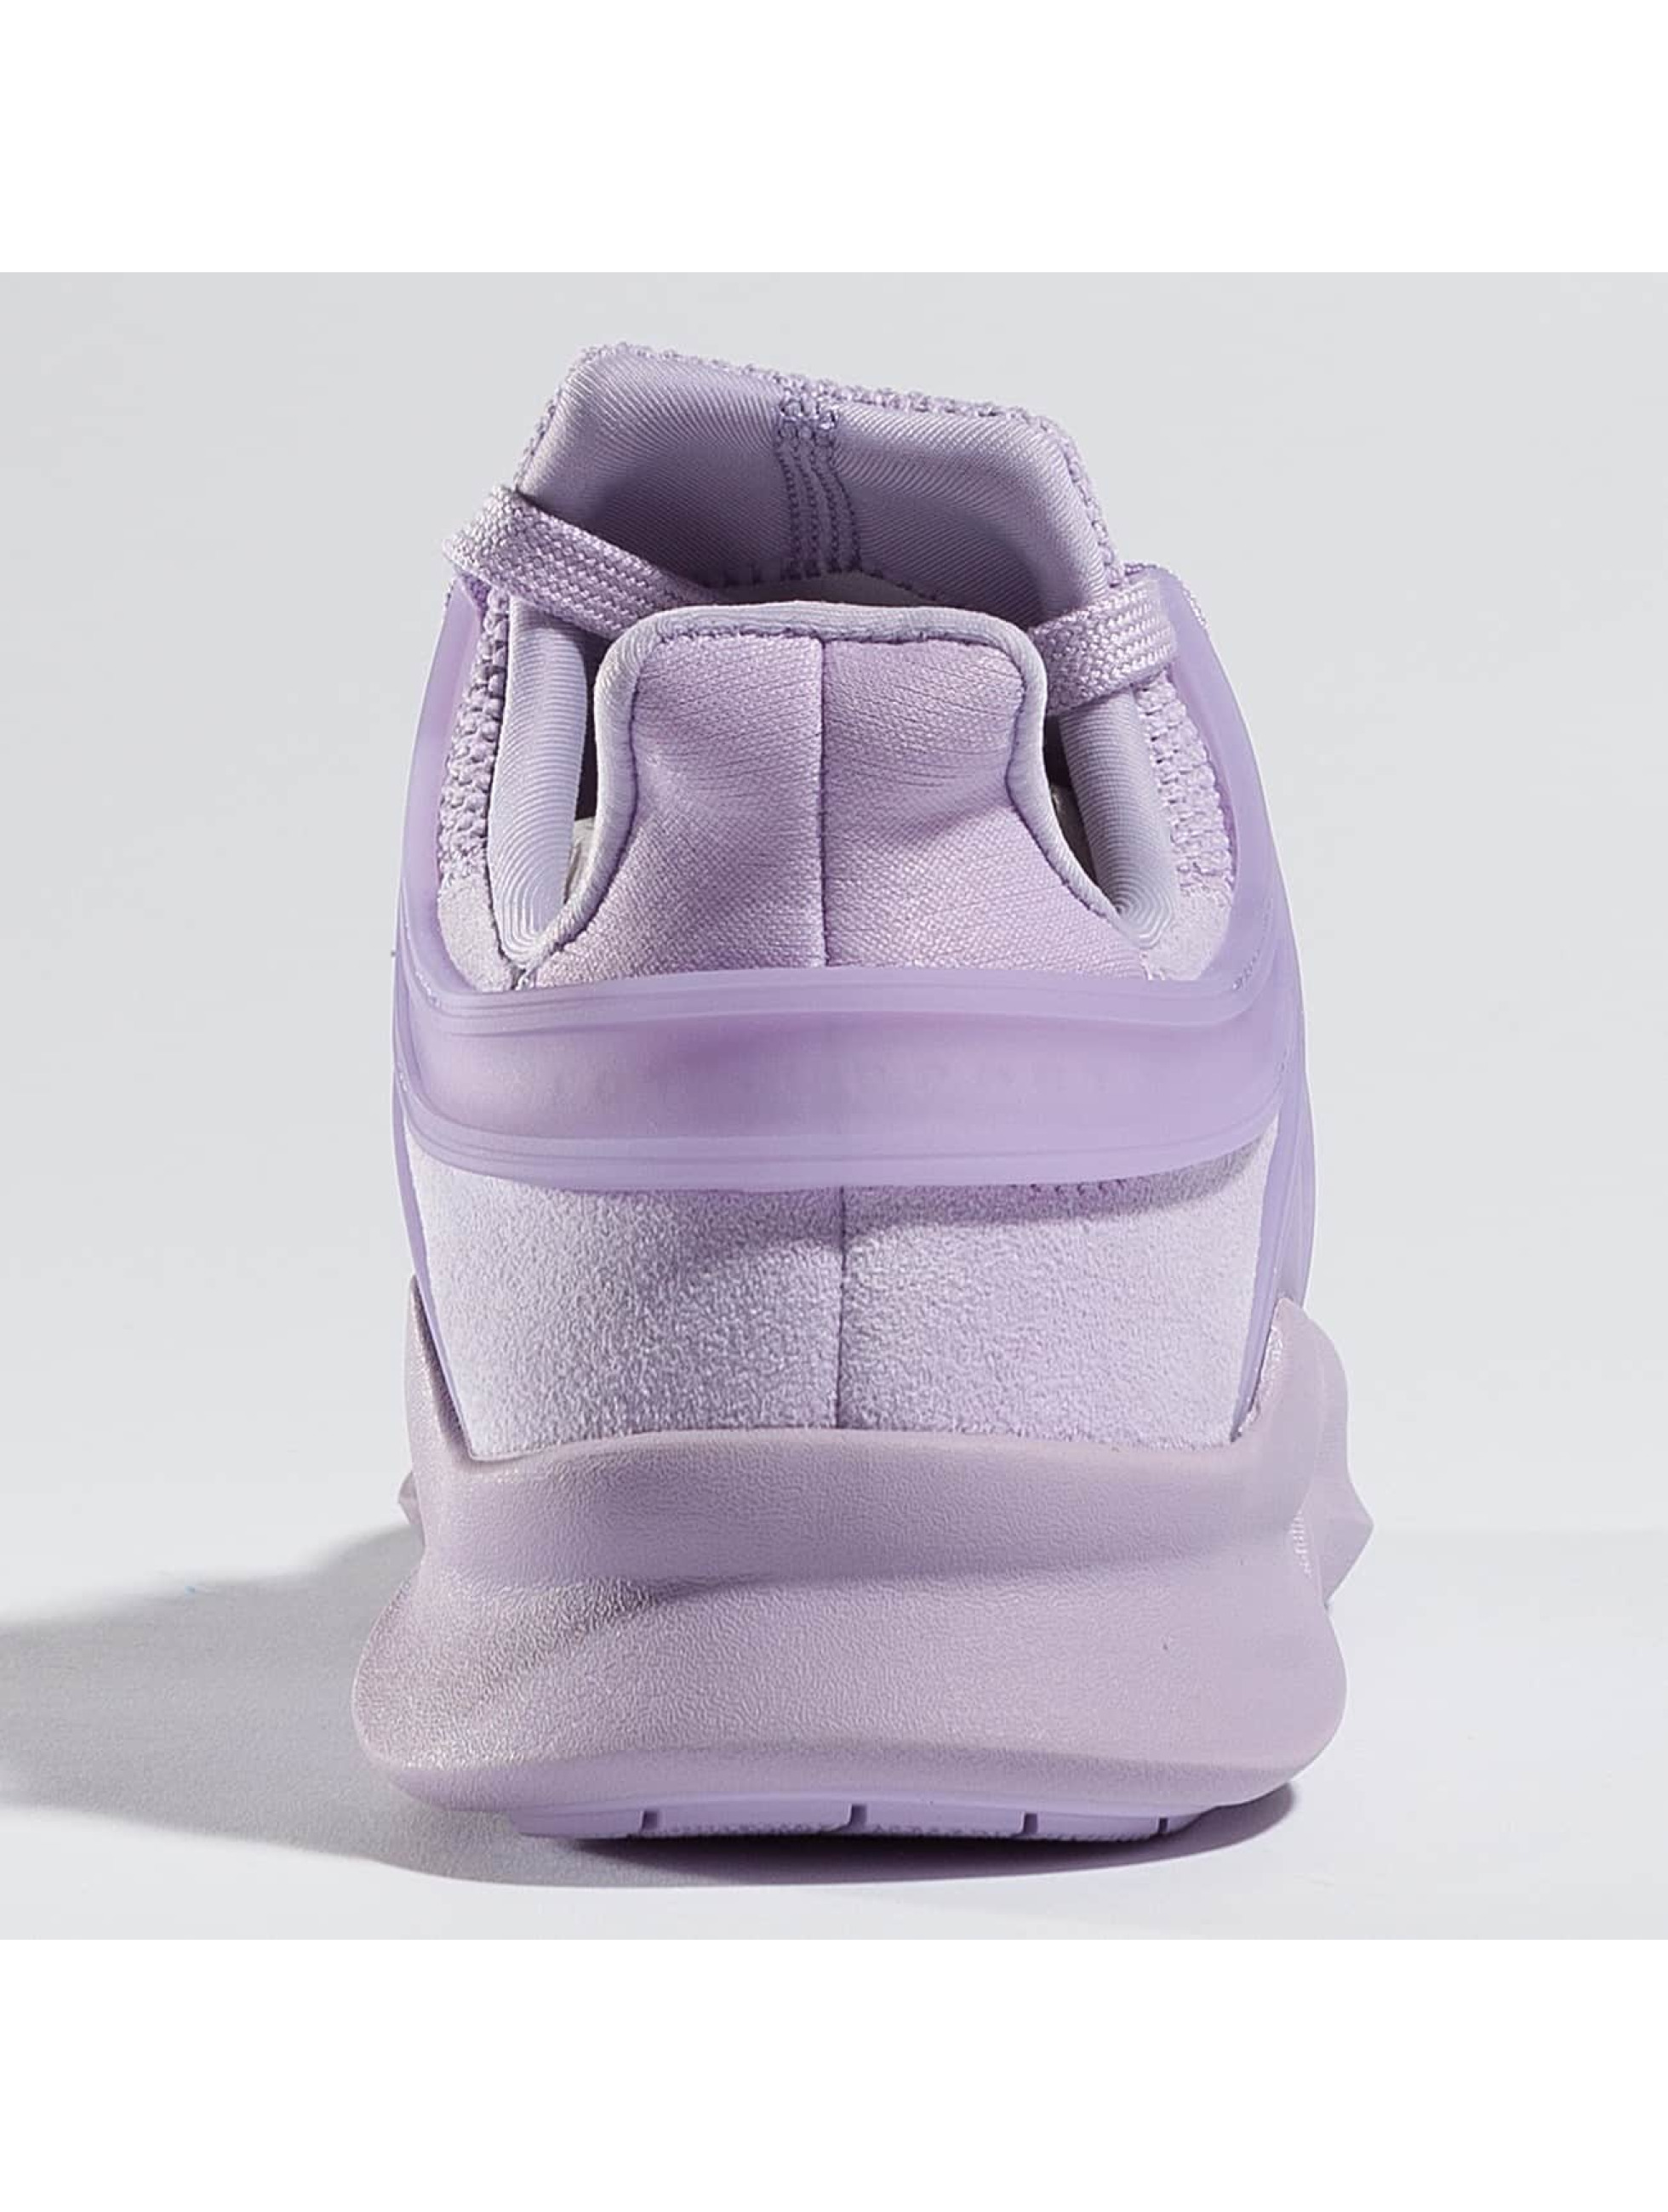 adidas originals Baskets Equipment Support ADV pourpre